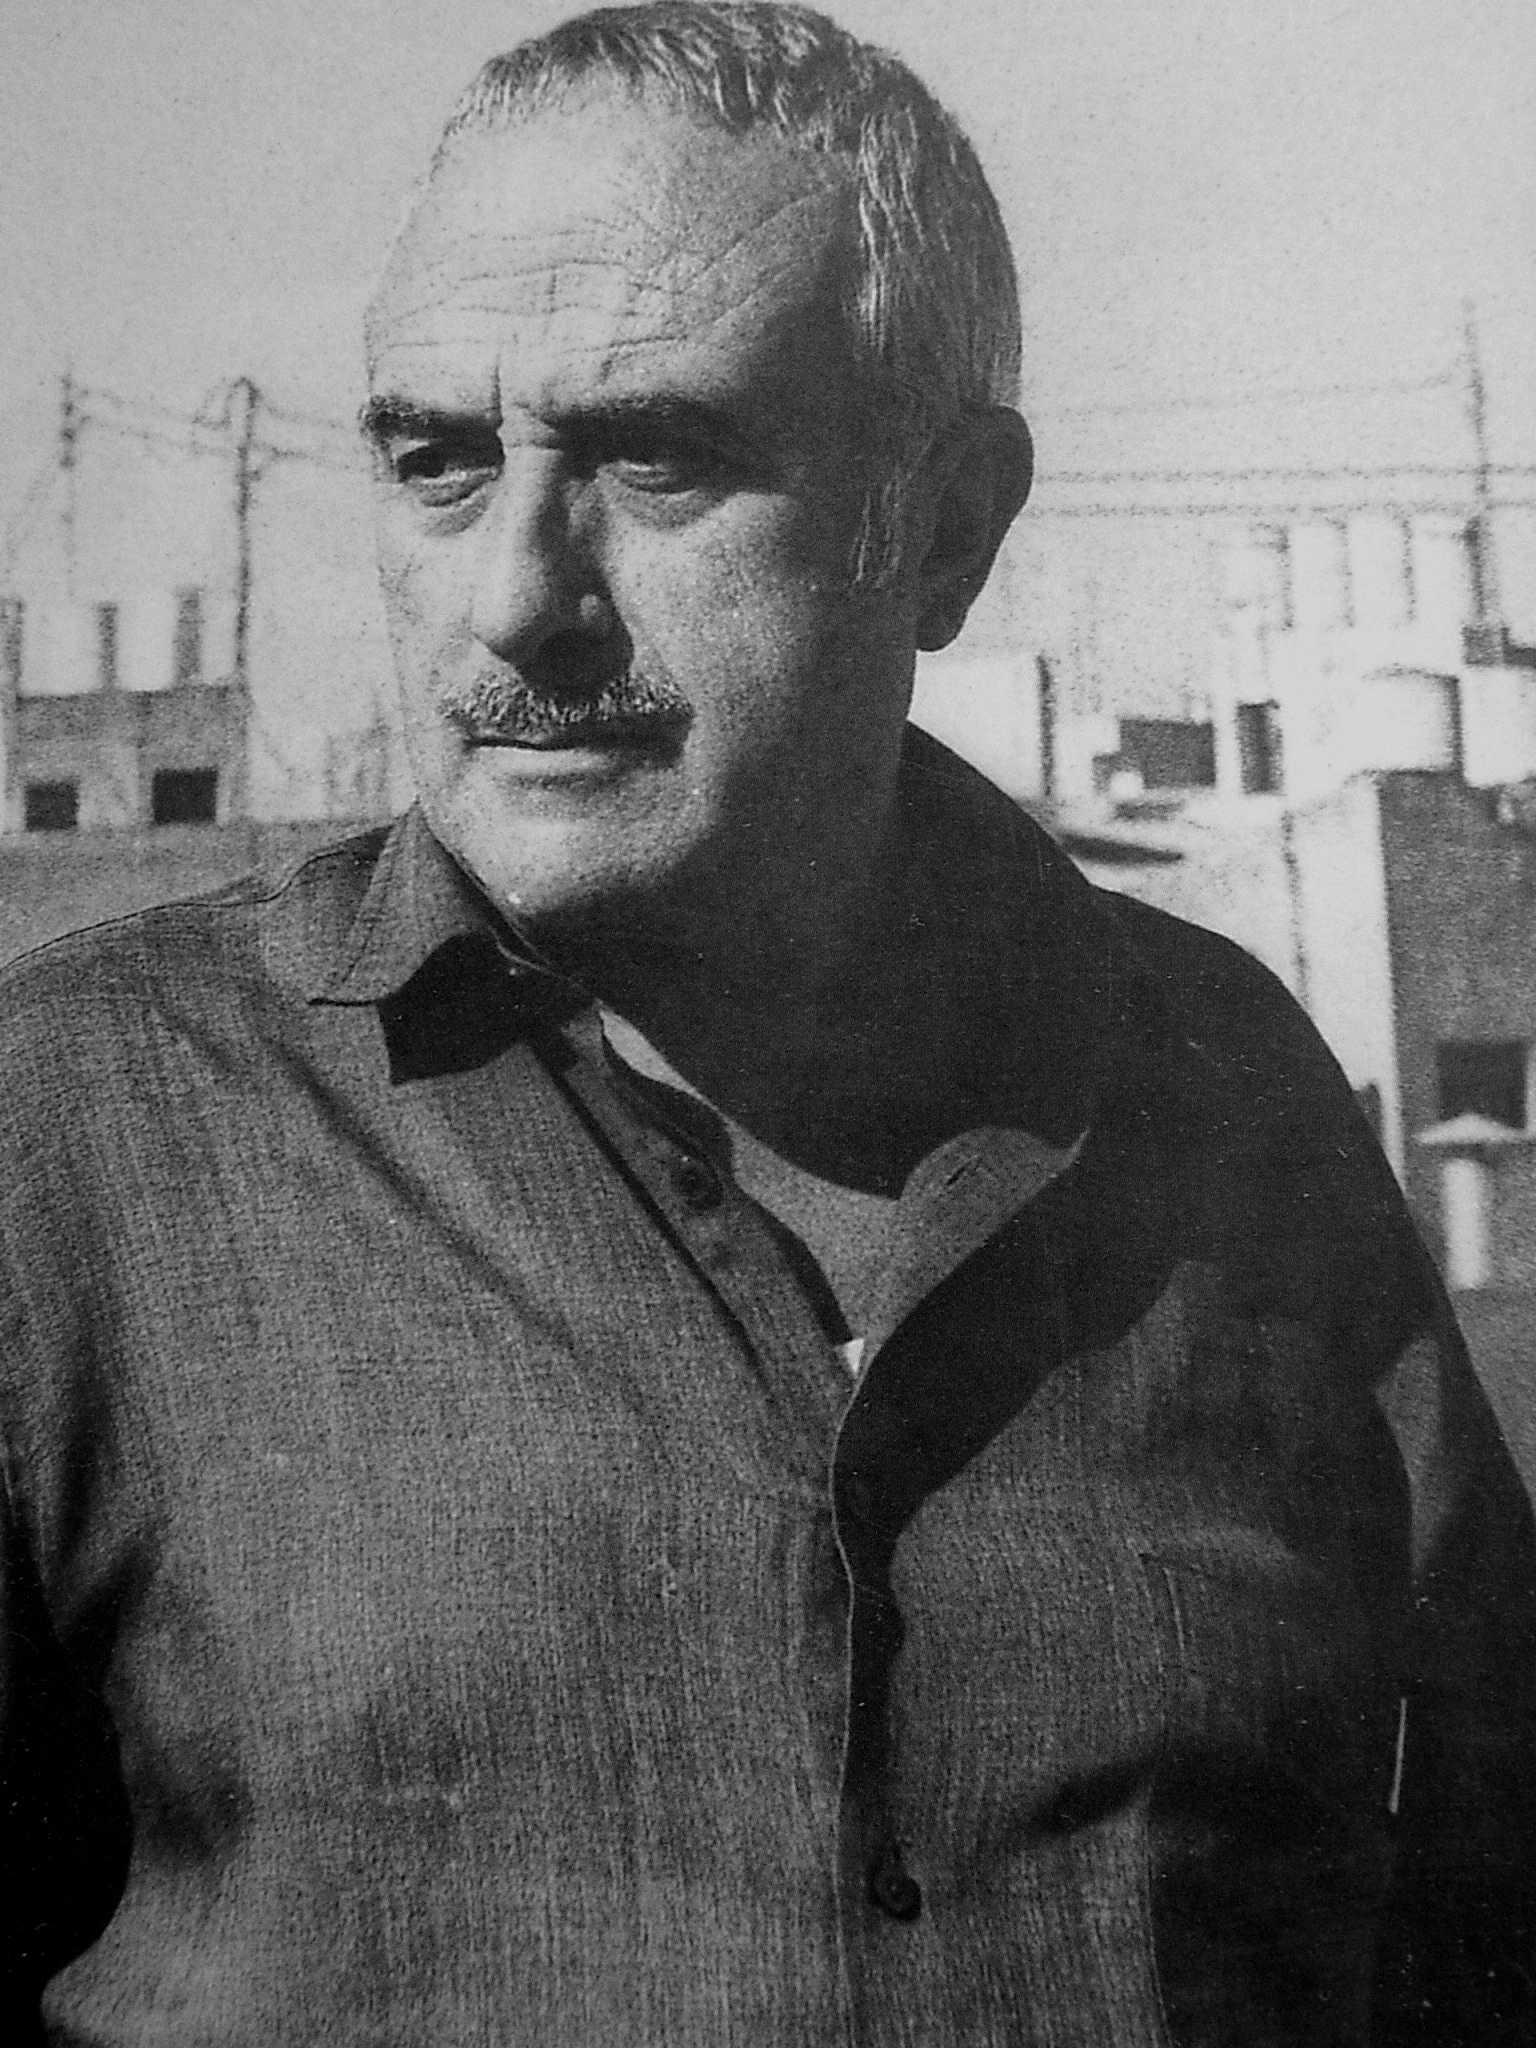 Jose María Falgas